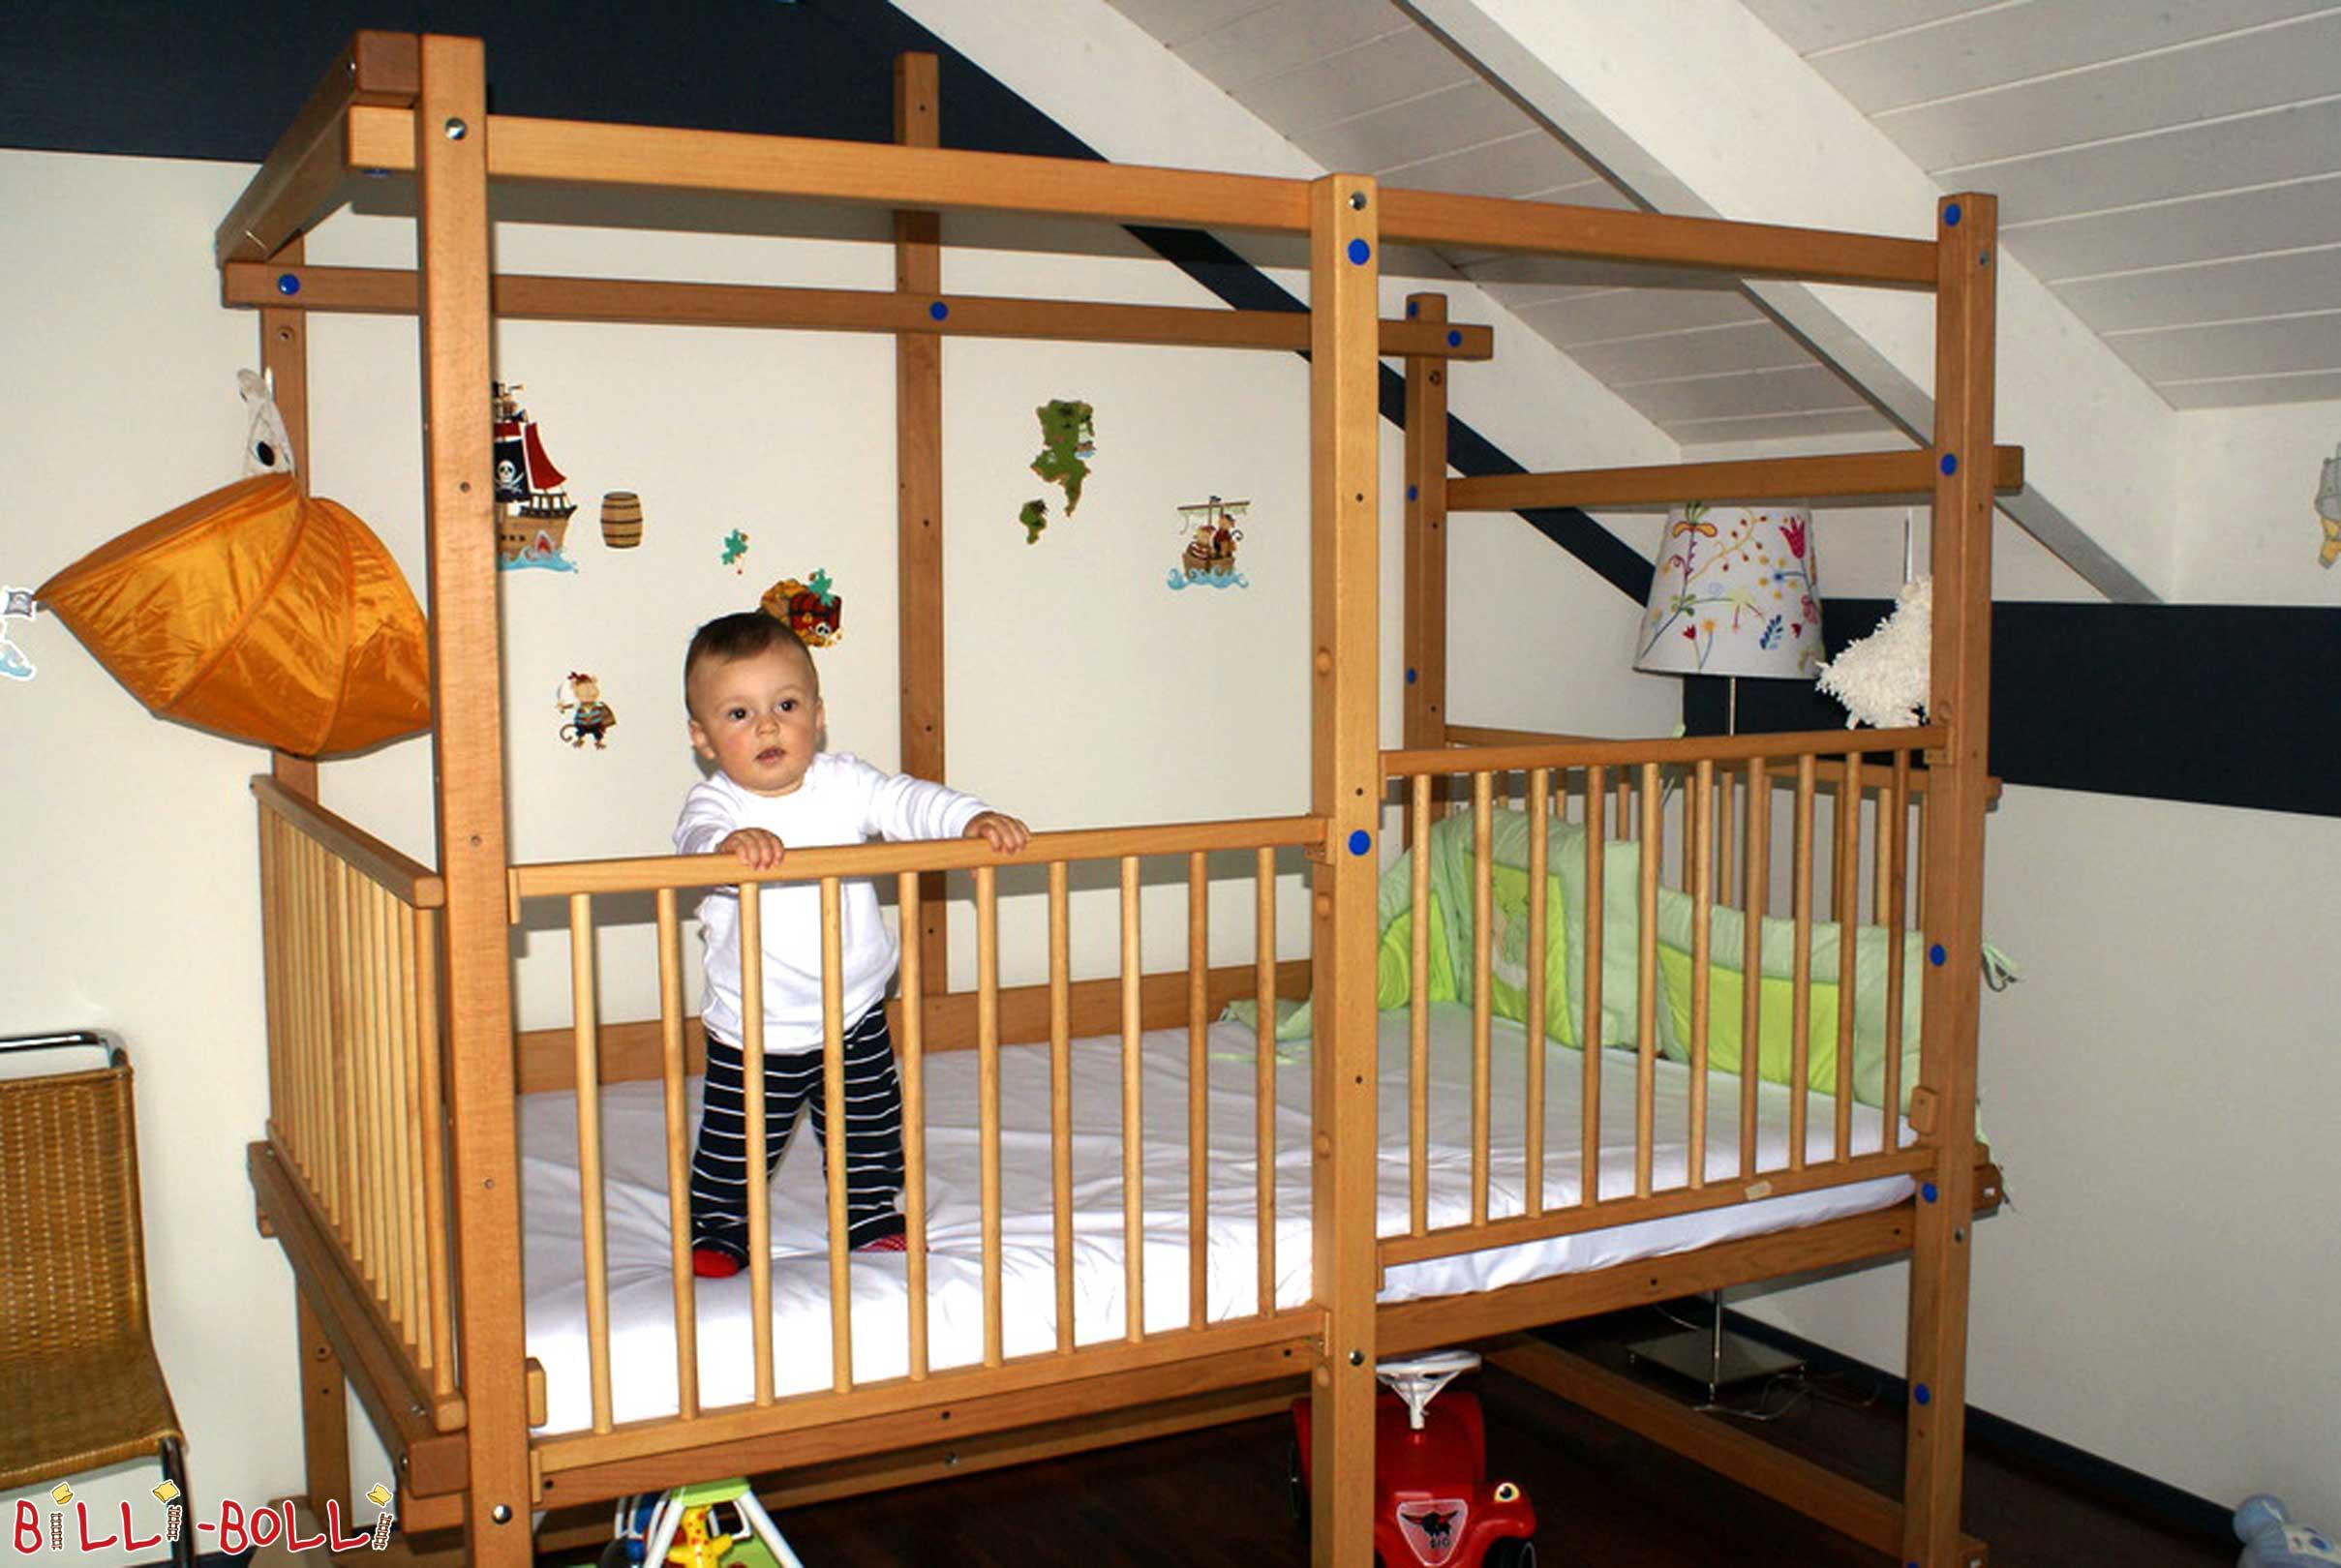 babybett billi bolli kinderm bel. Black Bedroom Furniture Sets. Home Design Ideas